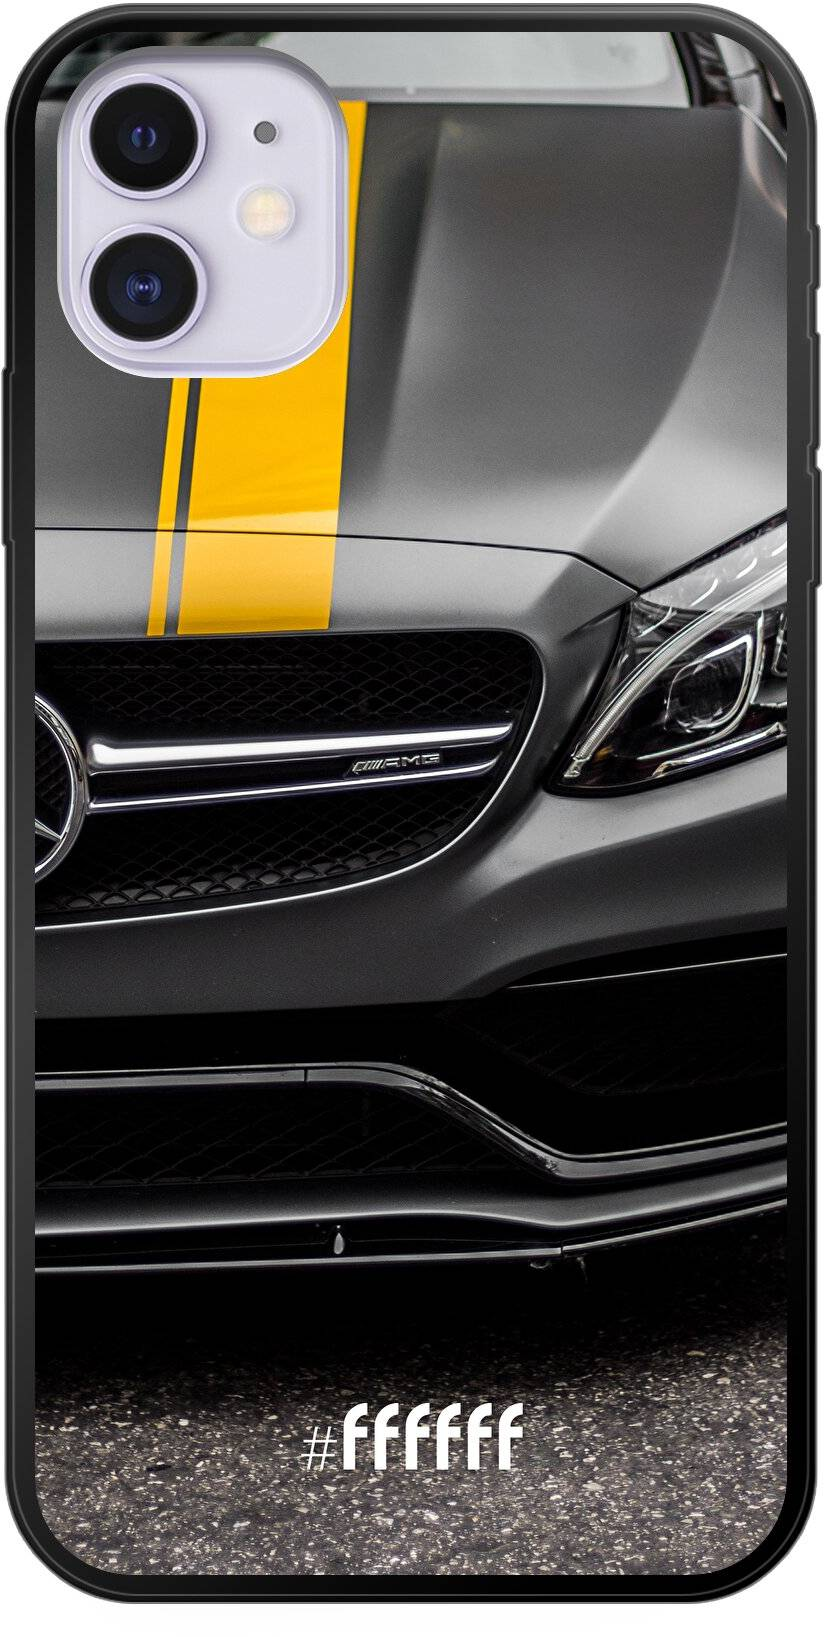 Luxury Car iPhone 11